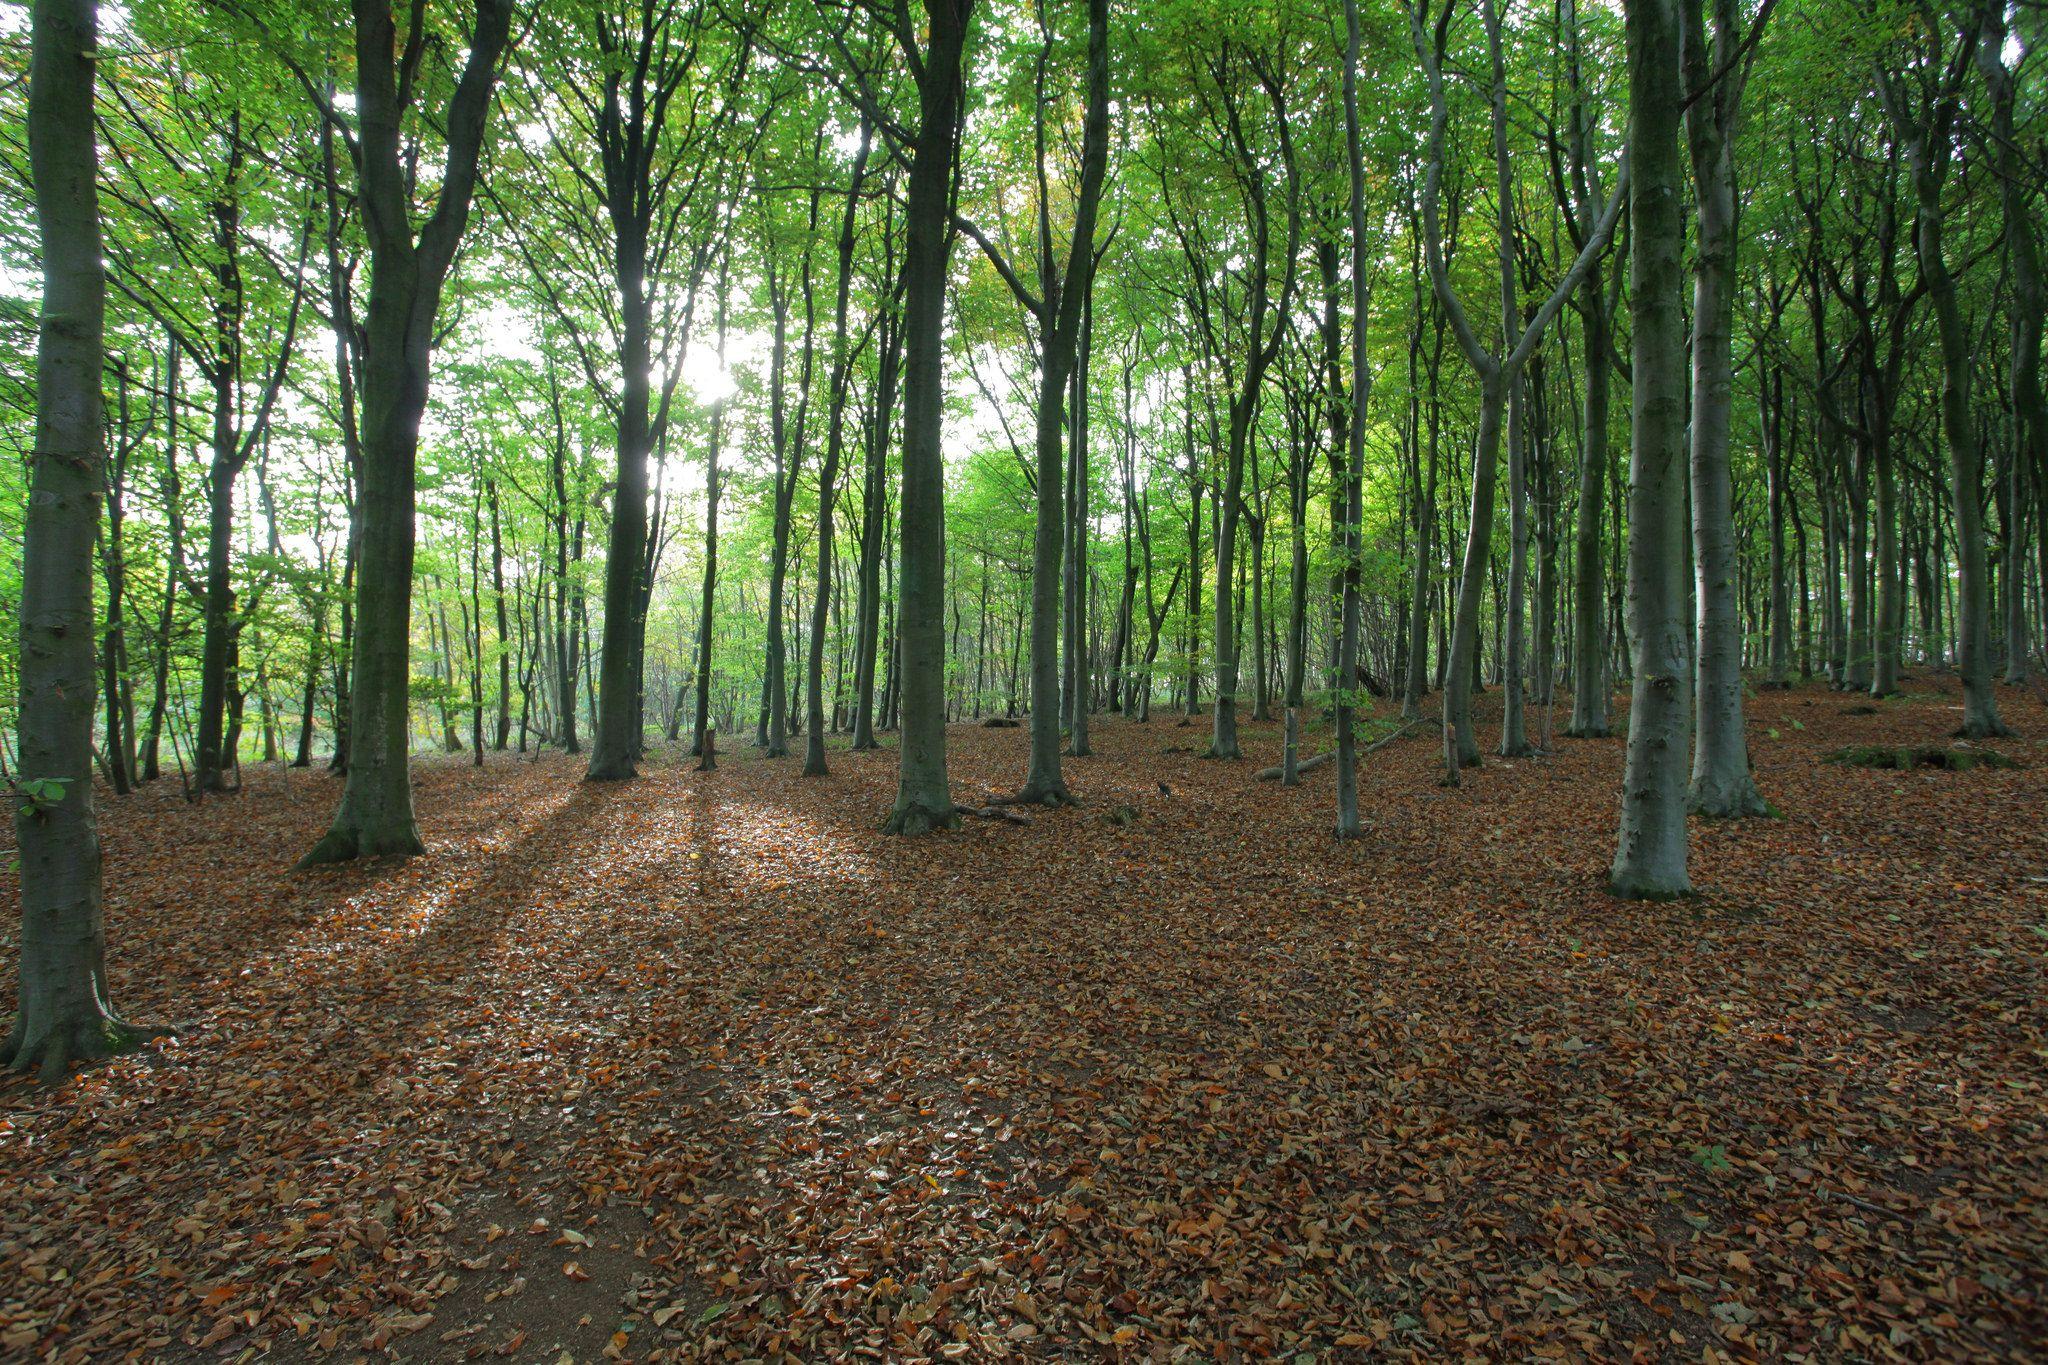 https://flic.kr/p/MQdSAR | Autumn Light | Sussex woodland in autumn  -  www.adamswaine.co.uk